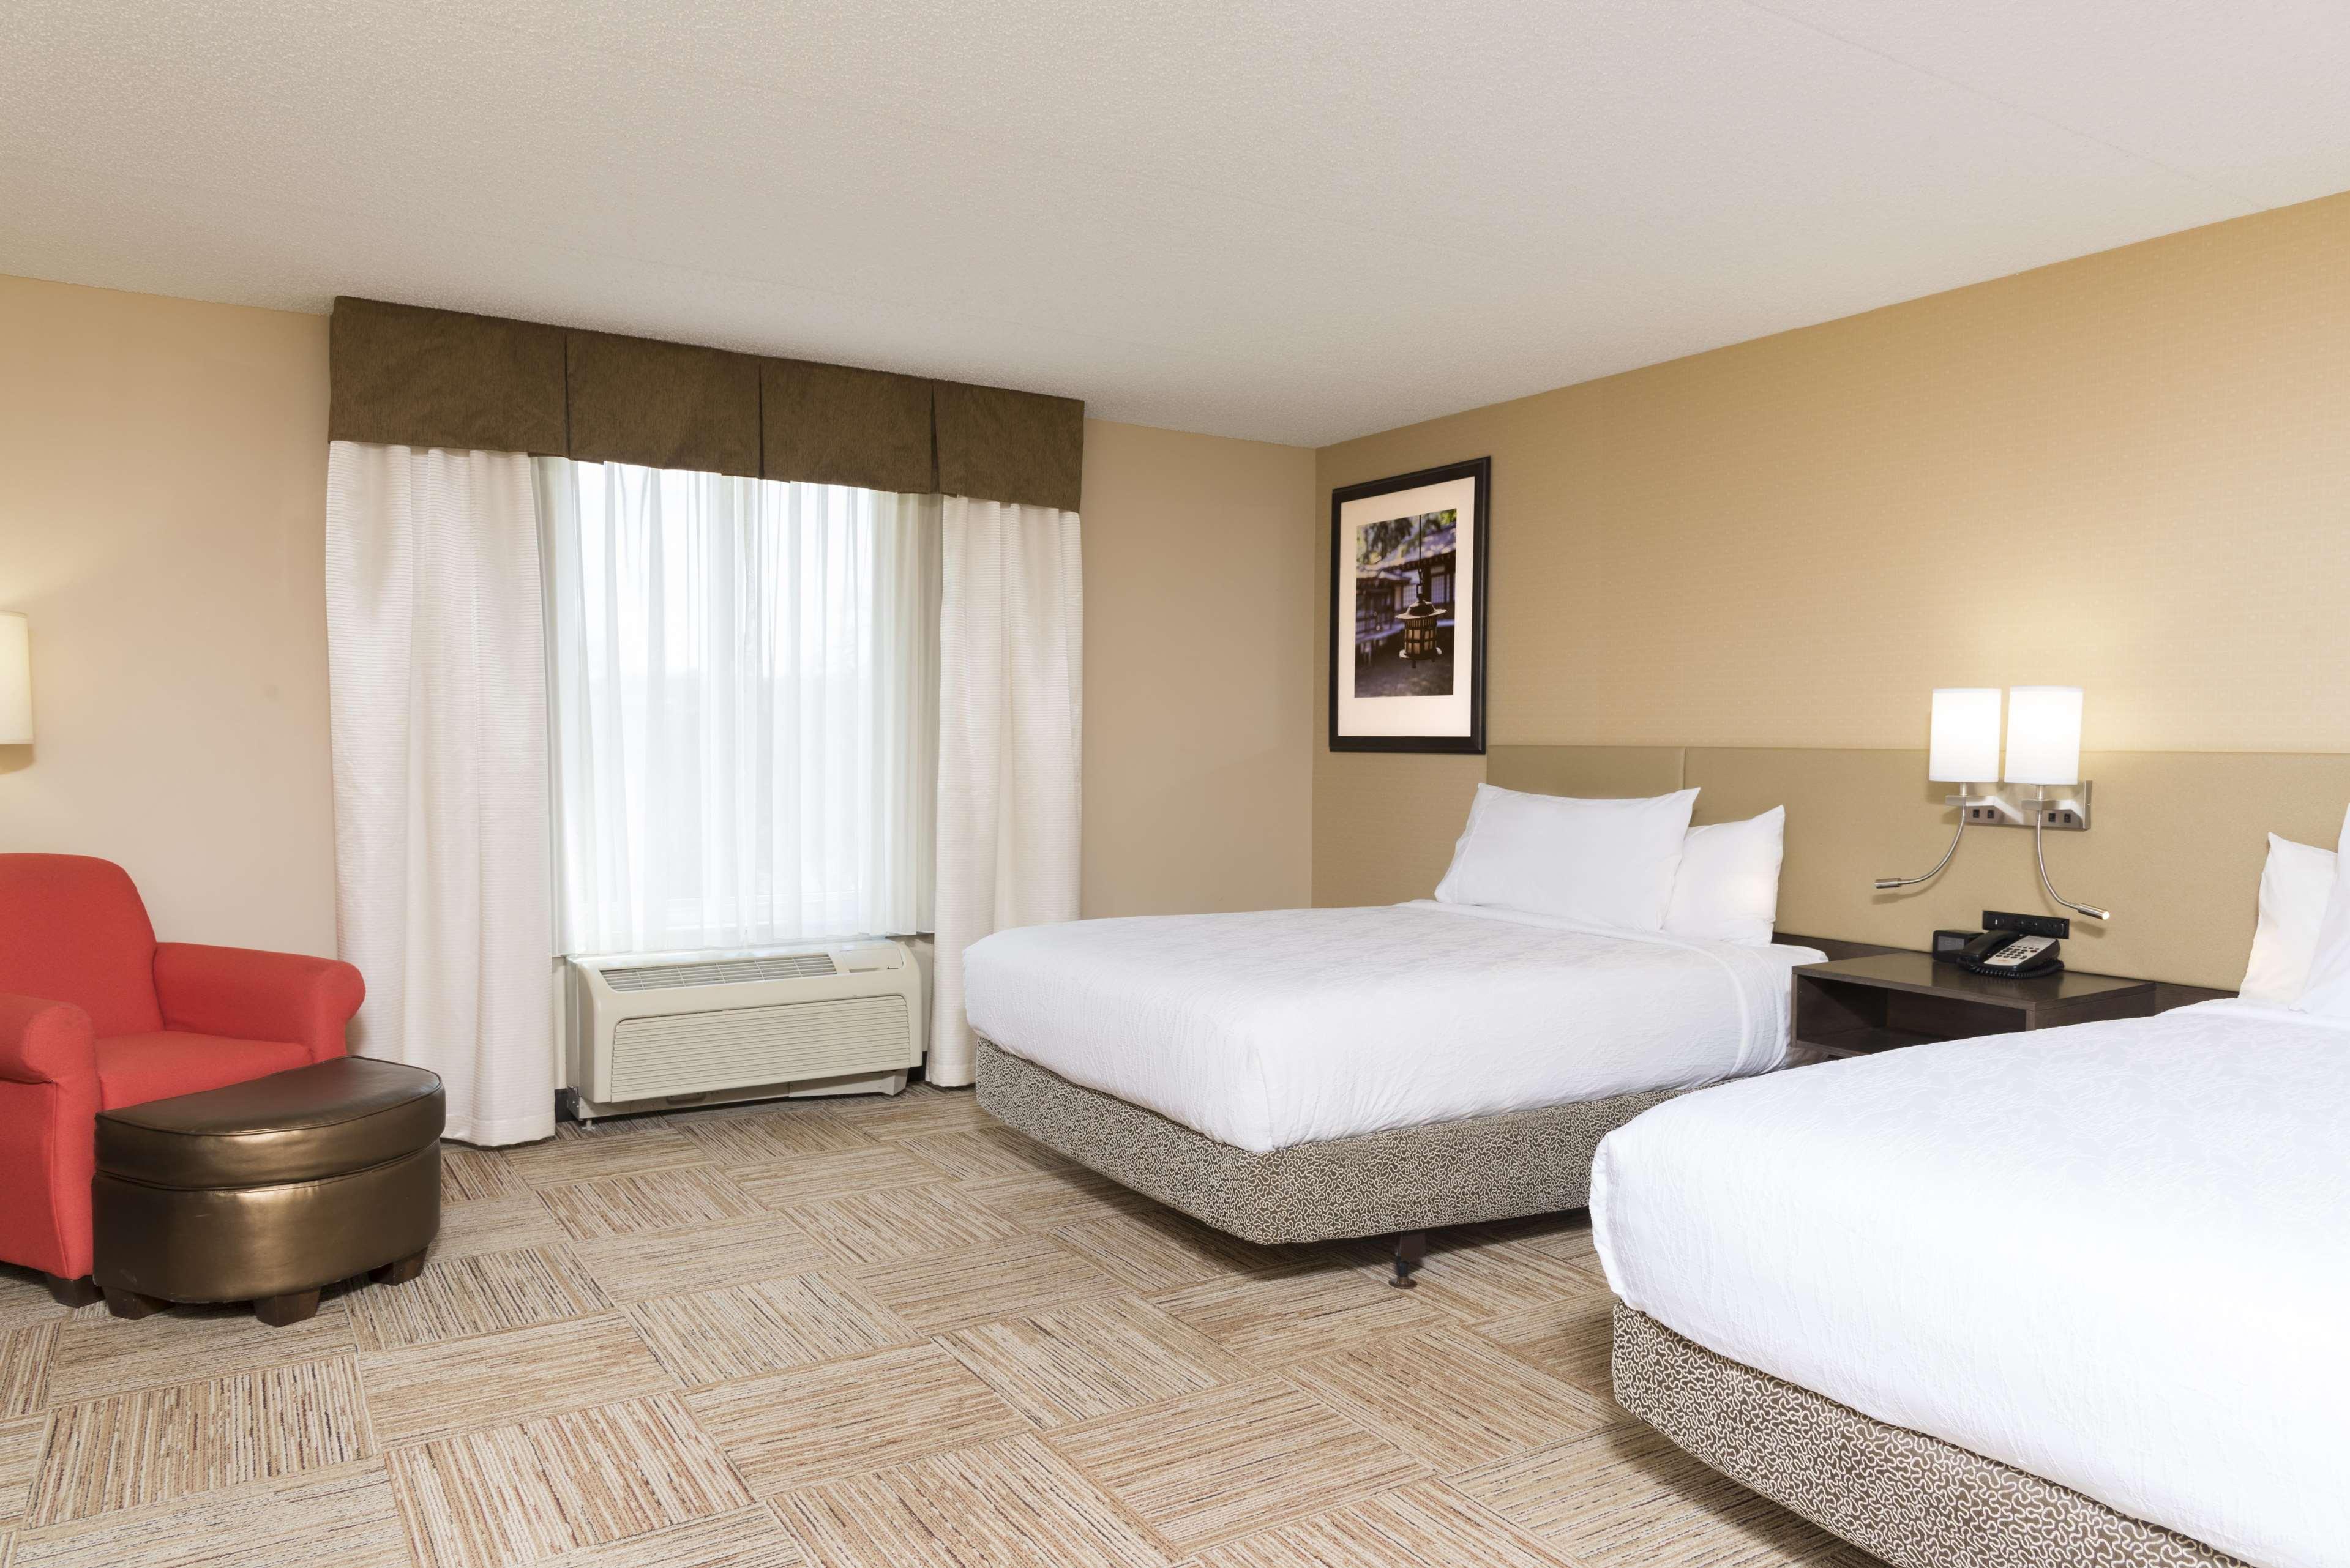 Hilton Garden Inn West Lafayette Wabash Landing image 29